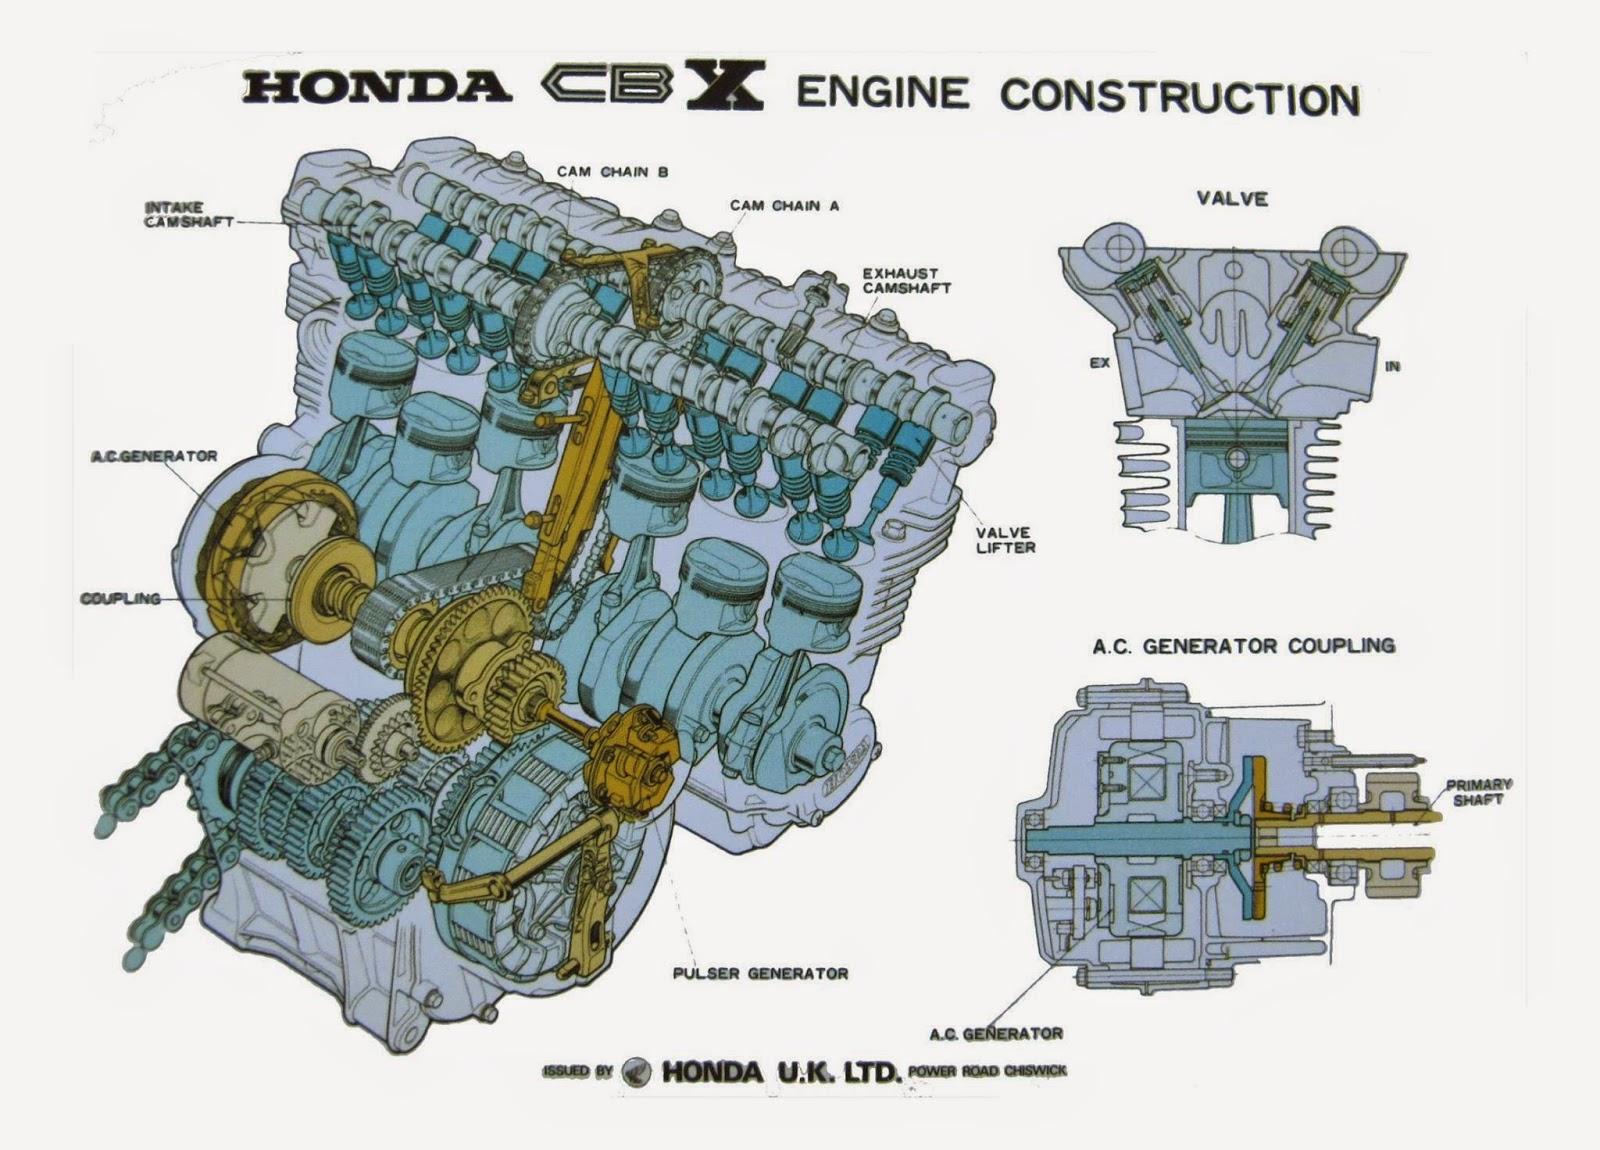 racing caf 232 photo 593 honda cbx engine construction